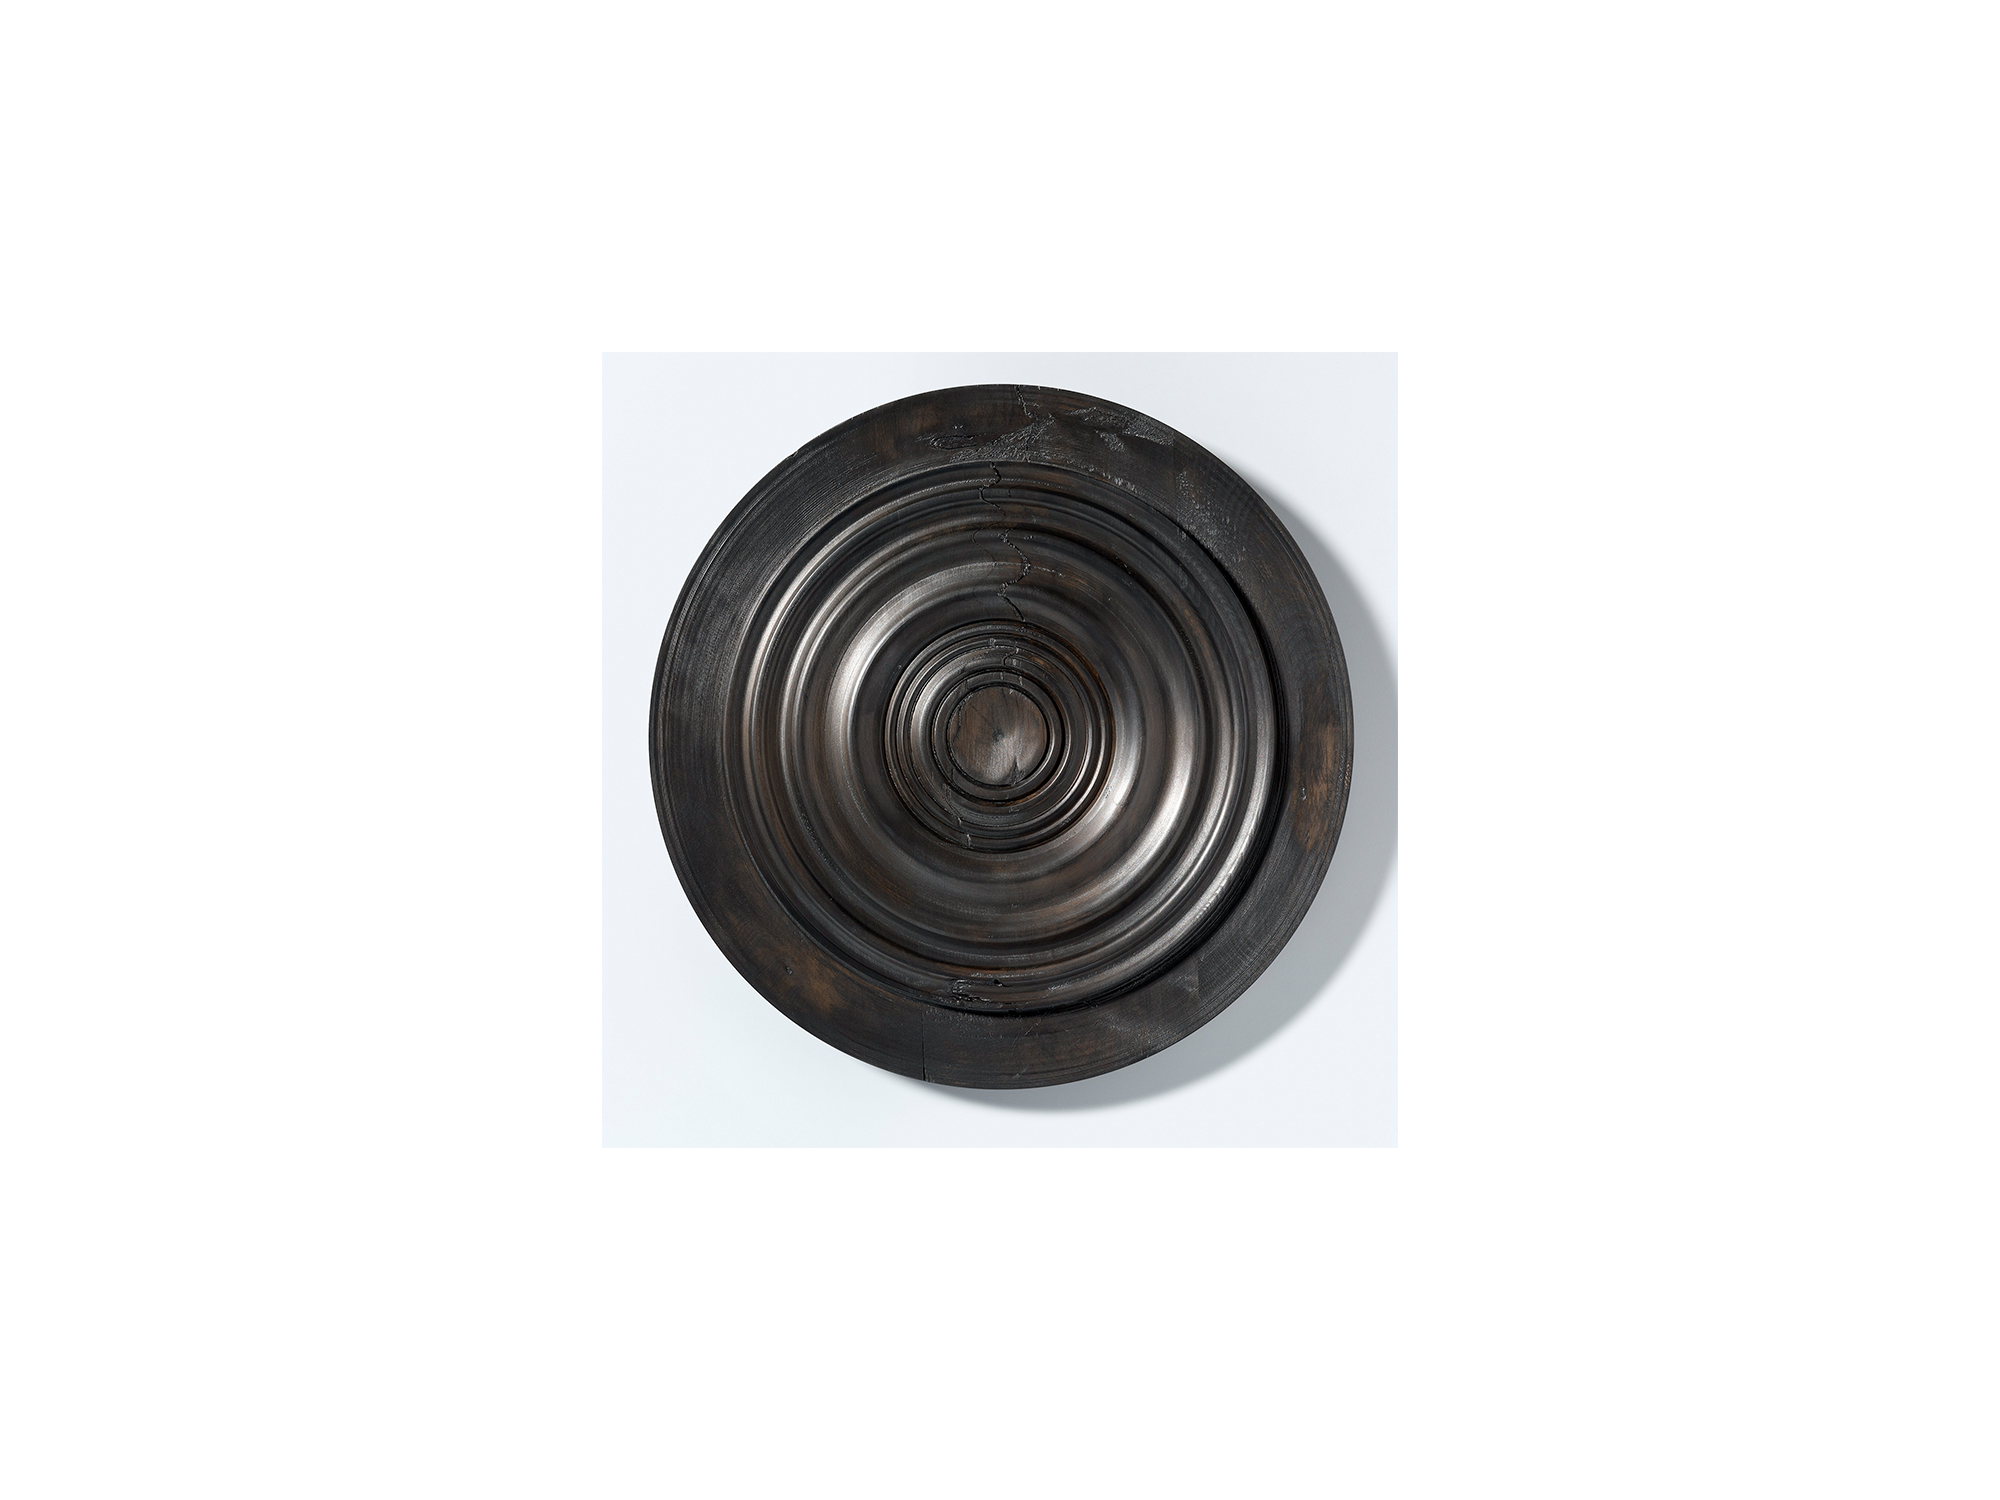 Jo Wilson   Milled/RJW#2 , 2018 reclaimed pine, pigment and Danish oil 50cm diameter x 5cm